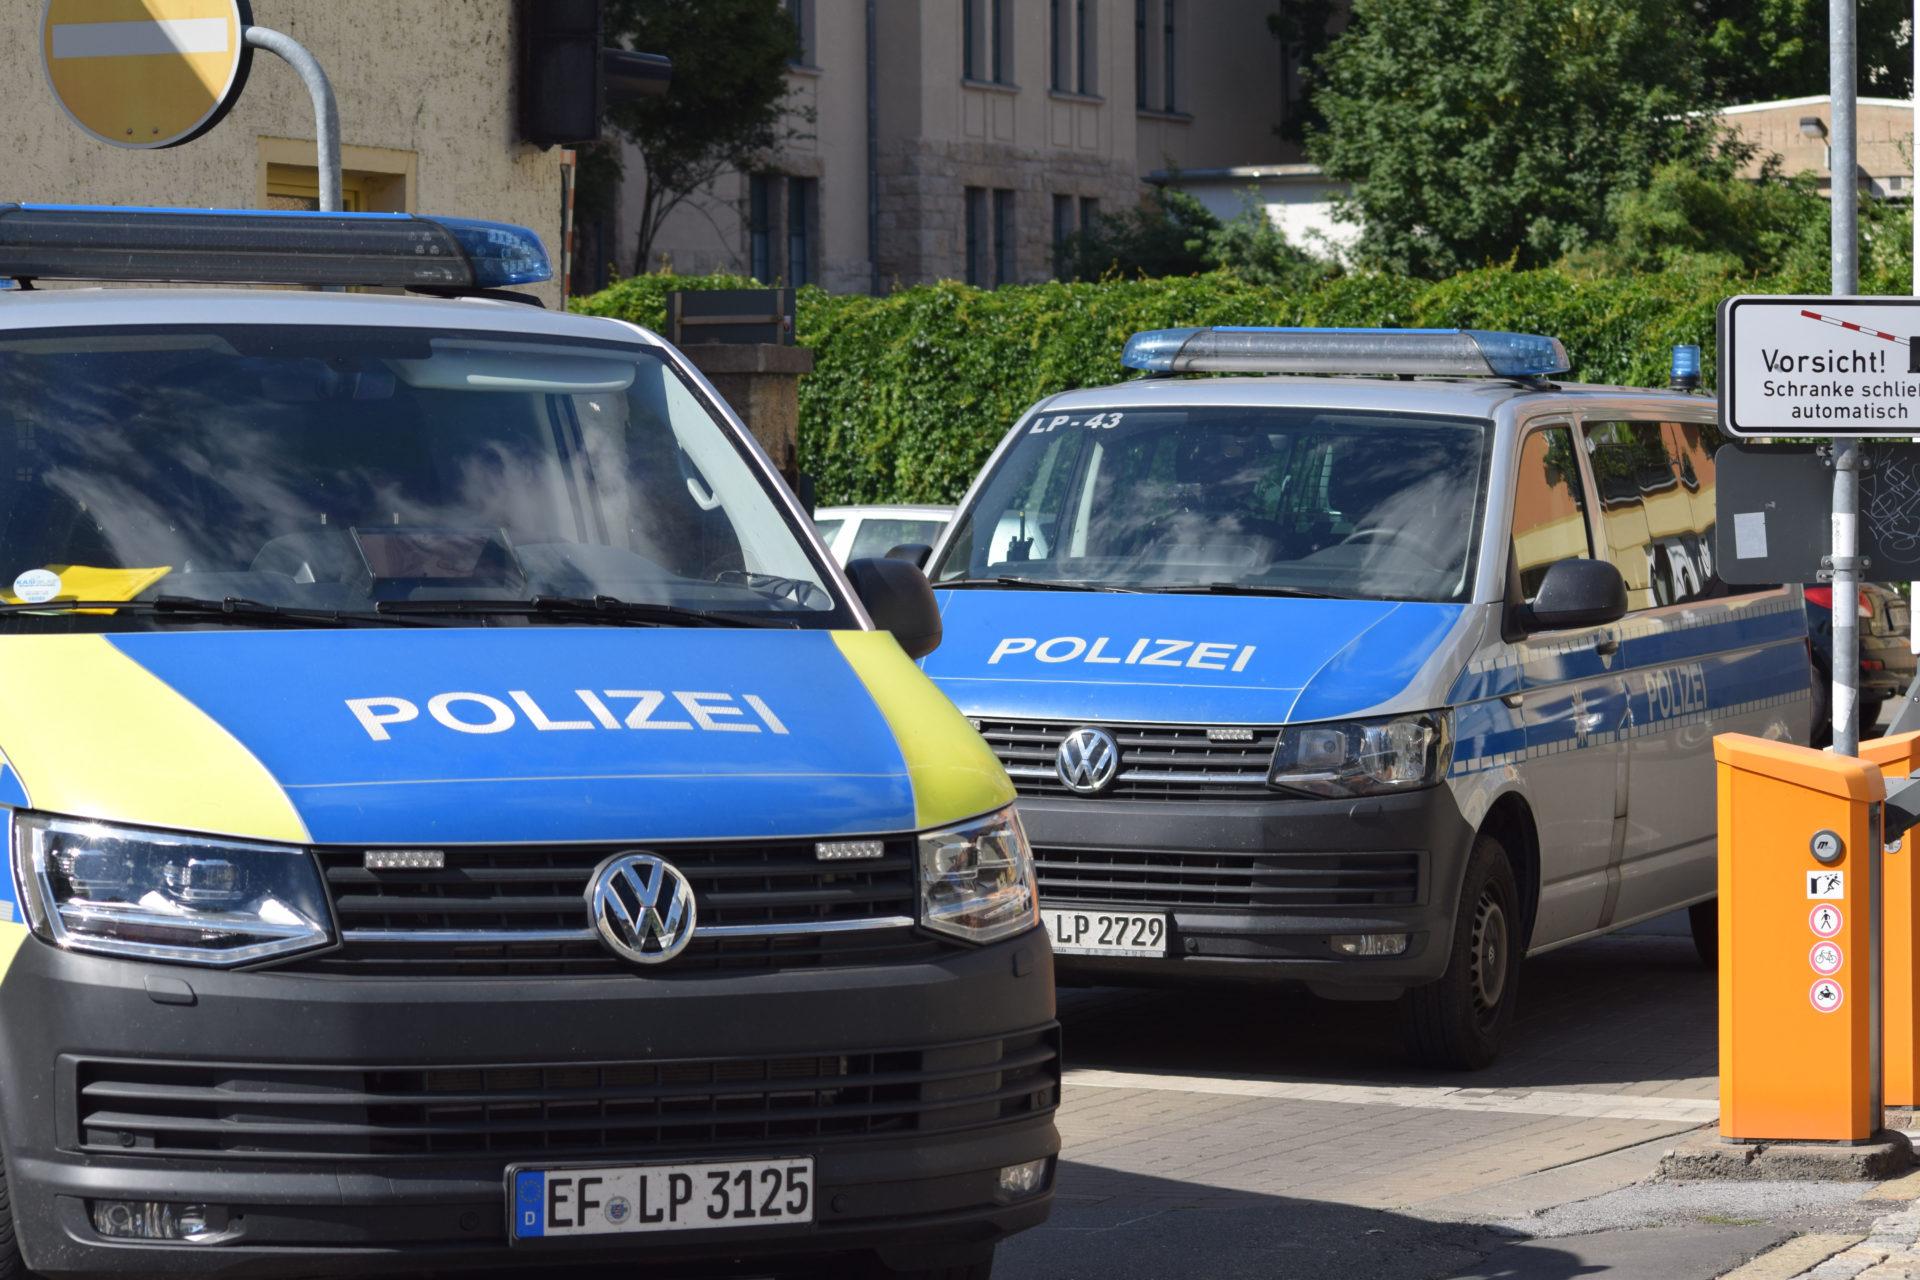 Neun Razzien nach rechtem Angriff in Erfurt